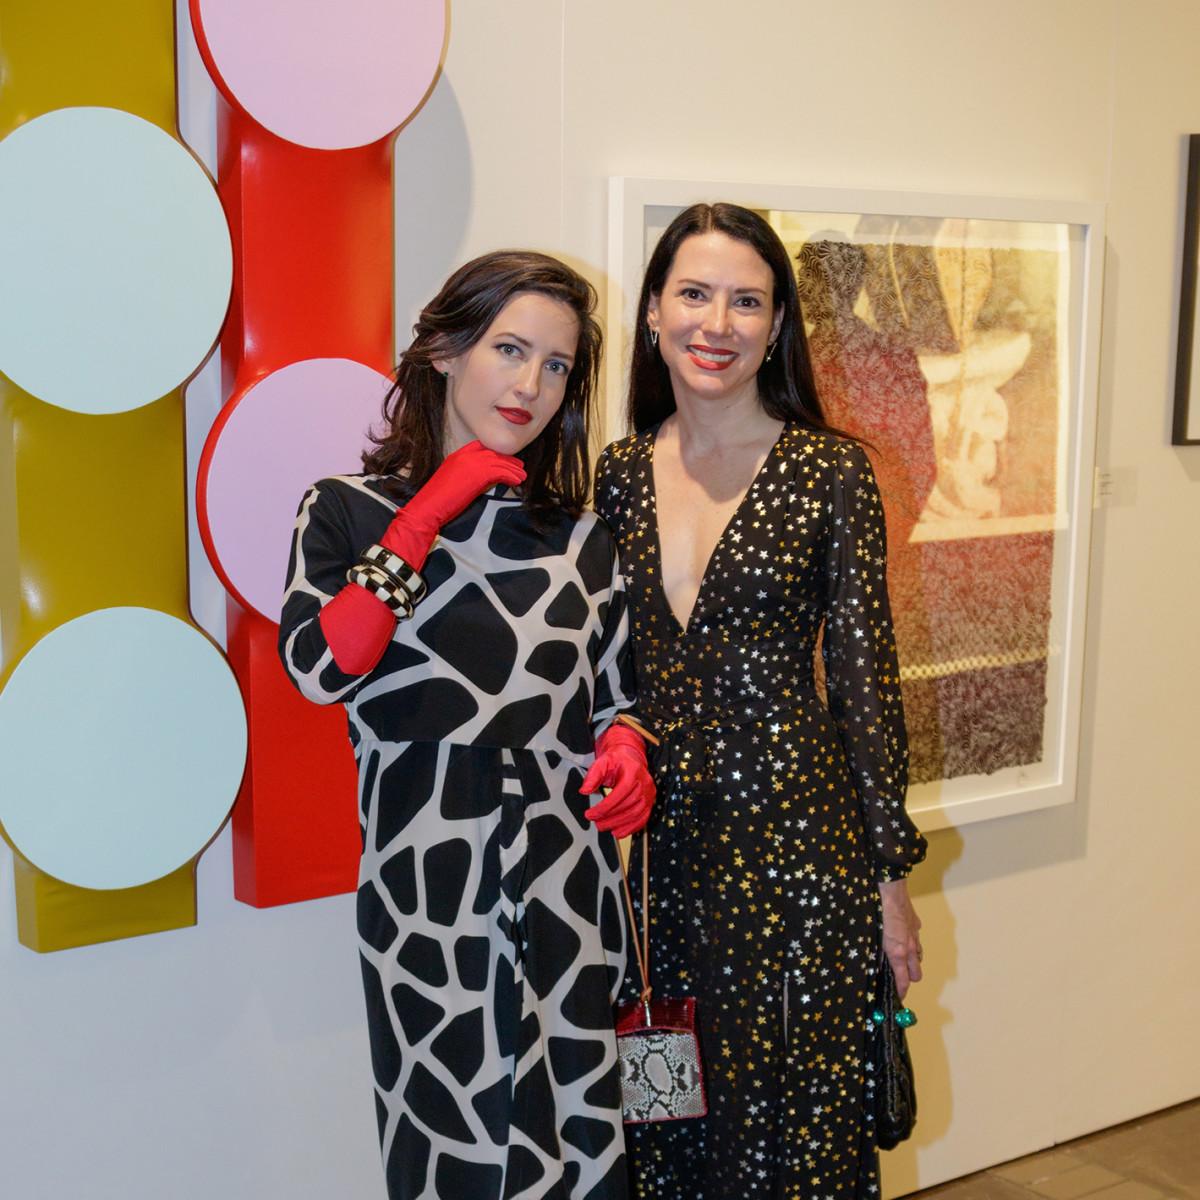 Samantha McCurdy, Nancy Koen